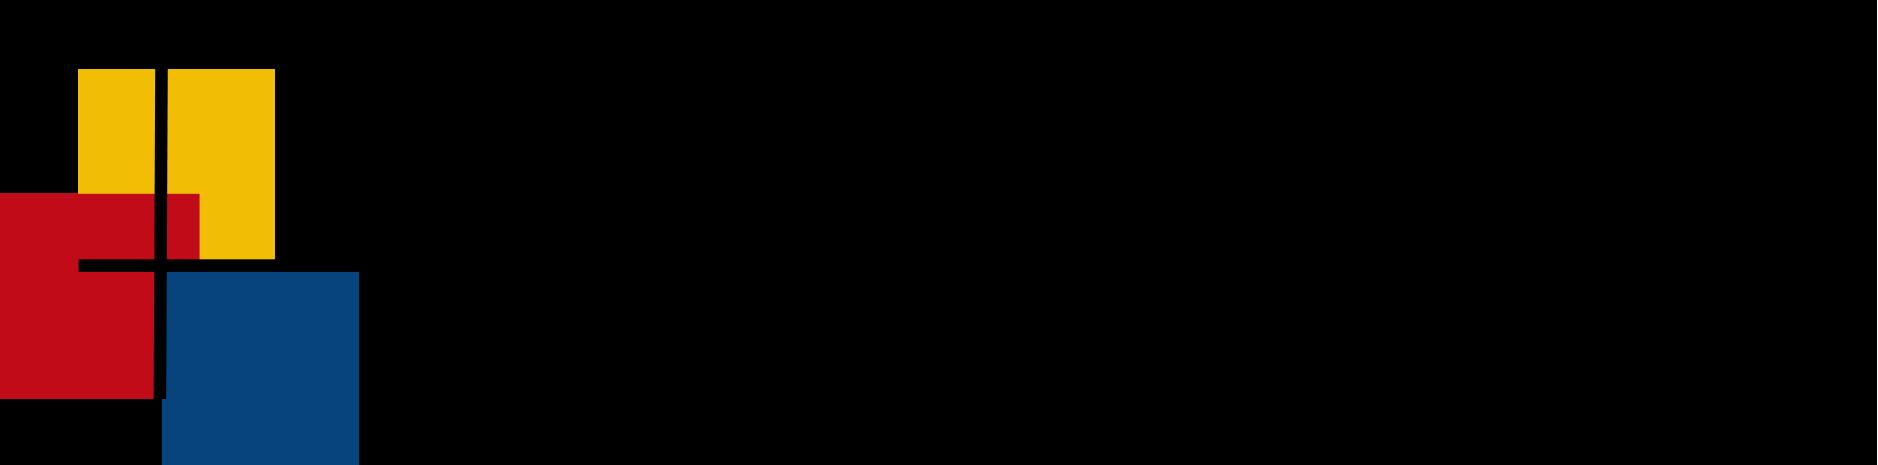 AKSA-Group